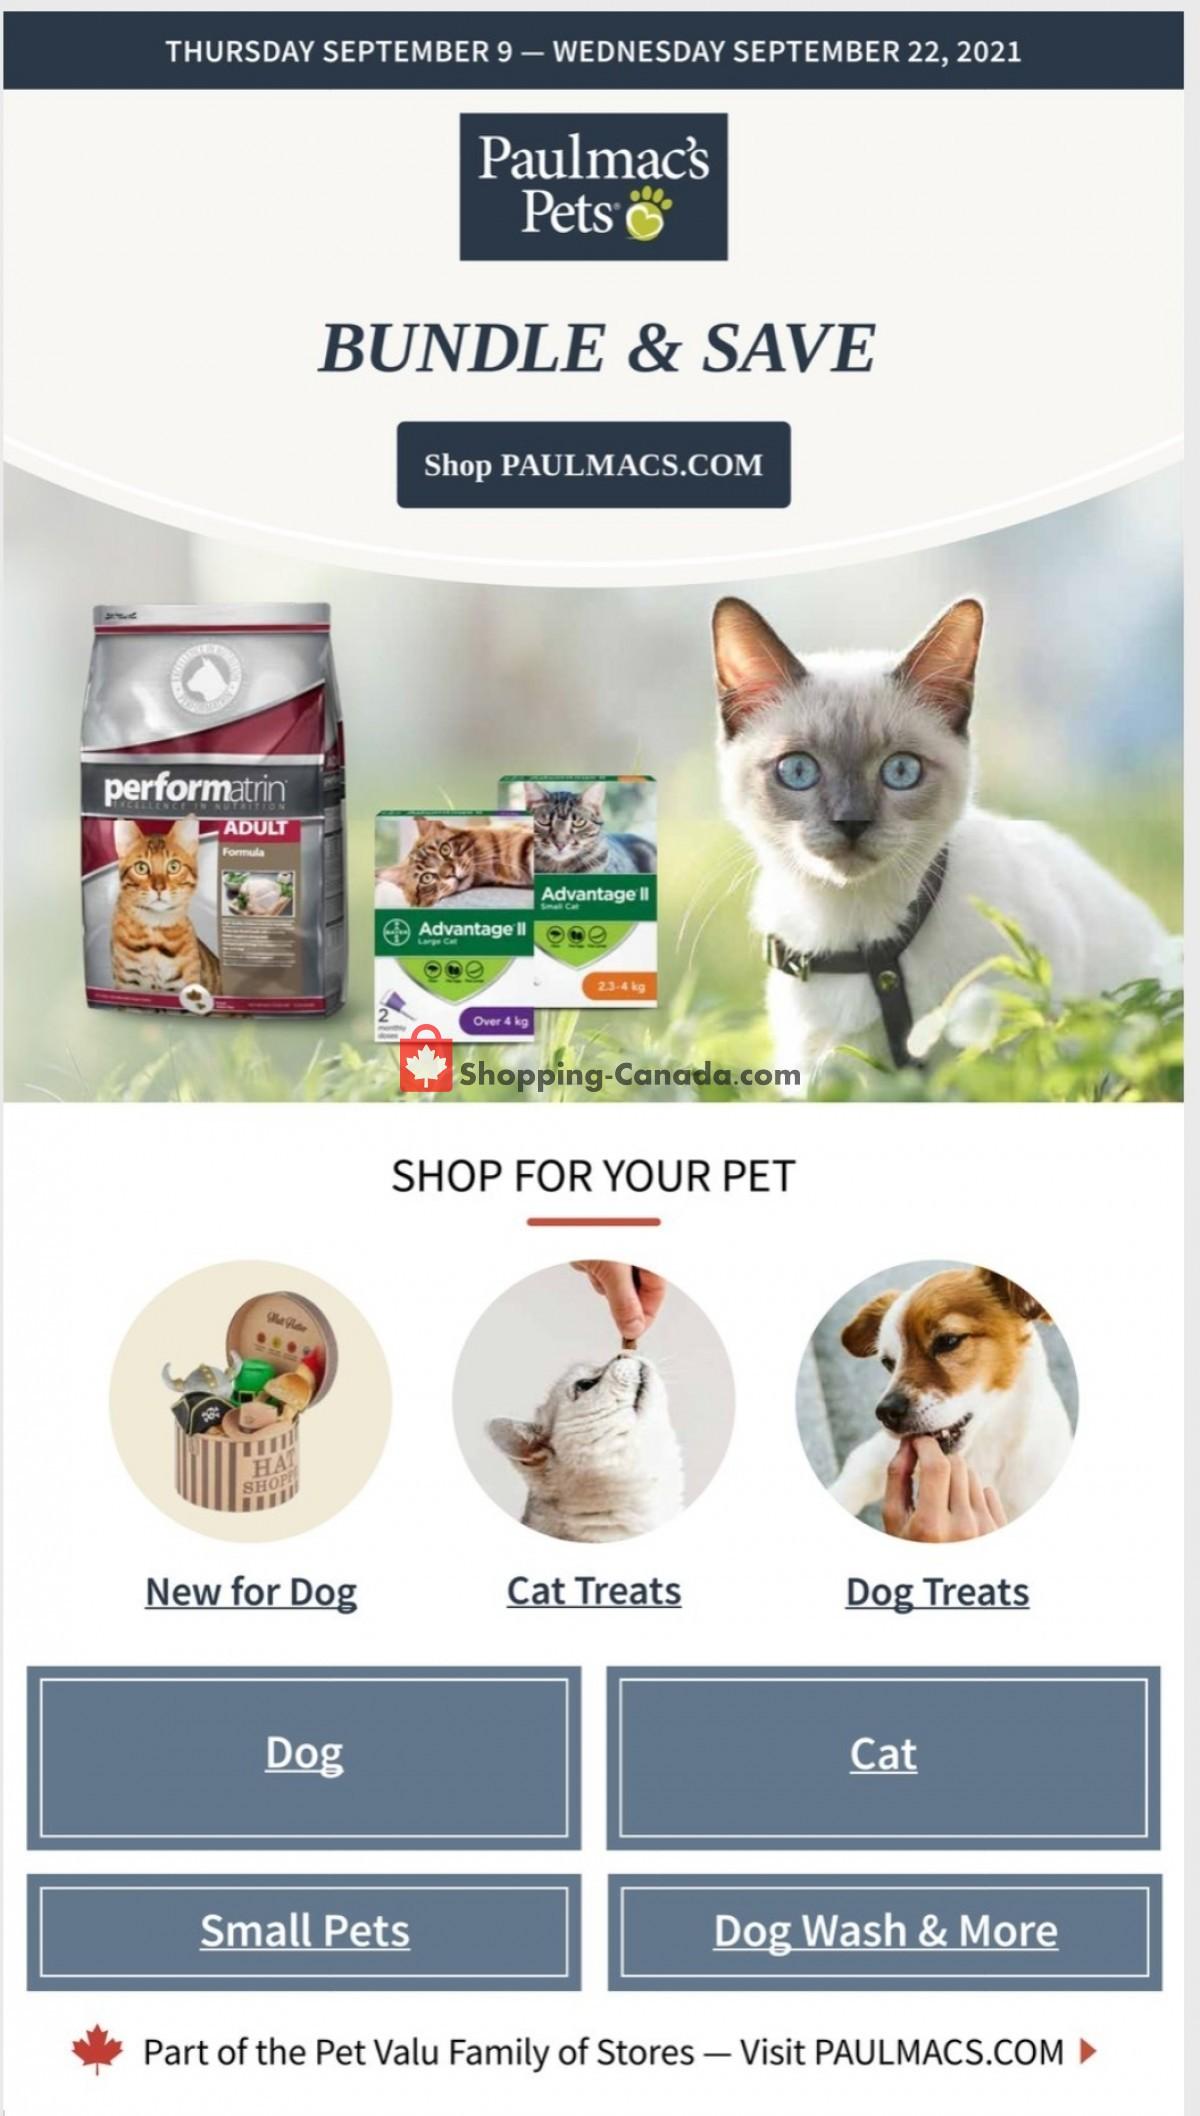 Flyer Paulmac's Pets Canada - from Thursday September 9, 2021 to Wednesday September 22, 2021